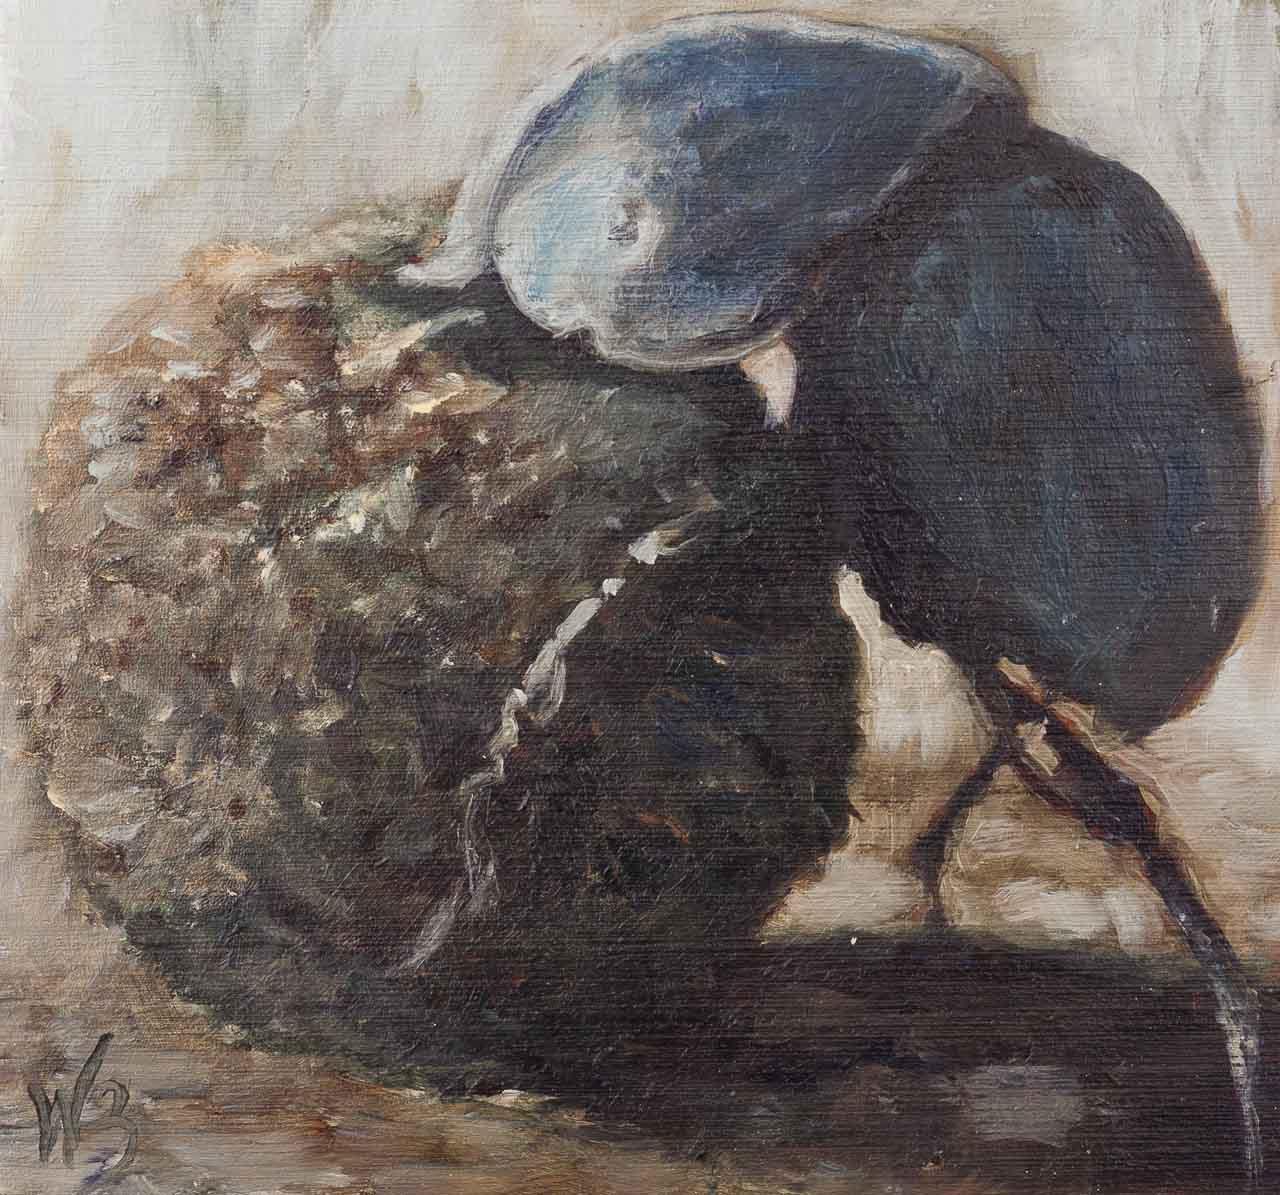 Dung Beetle Miniature